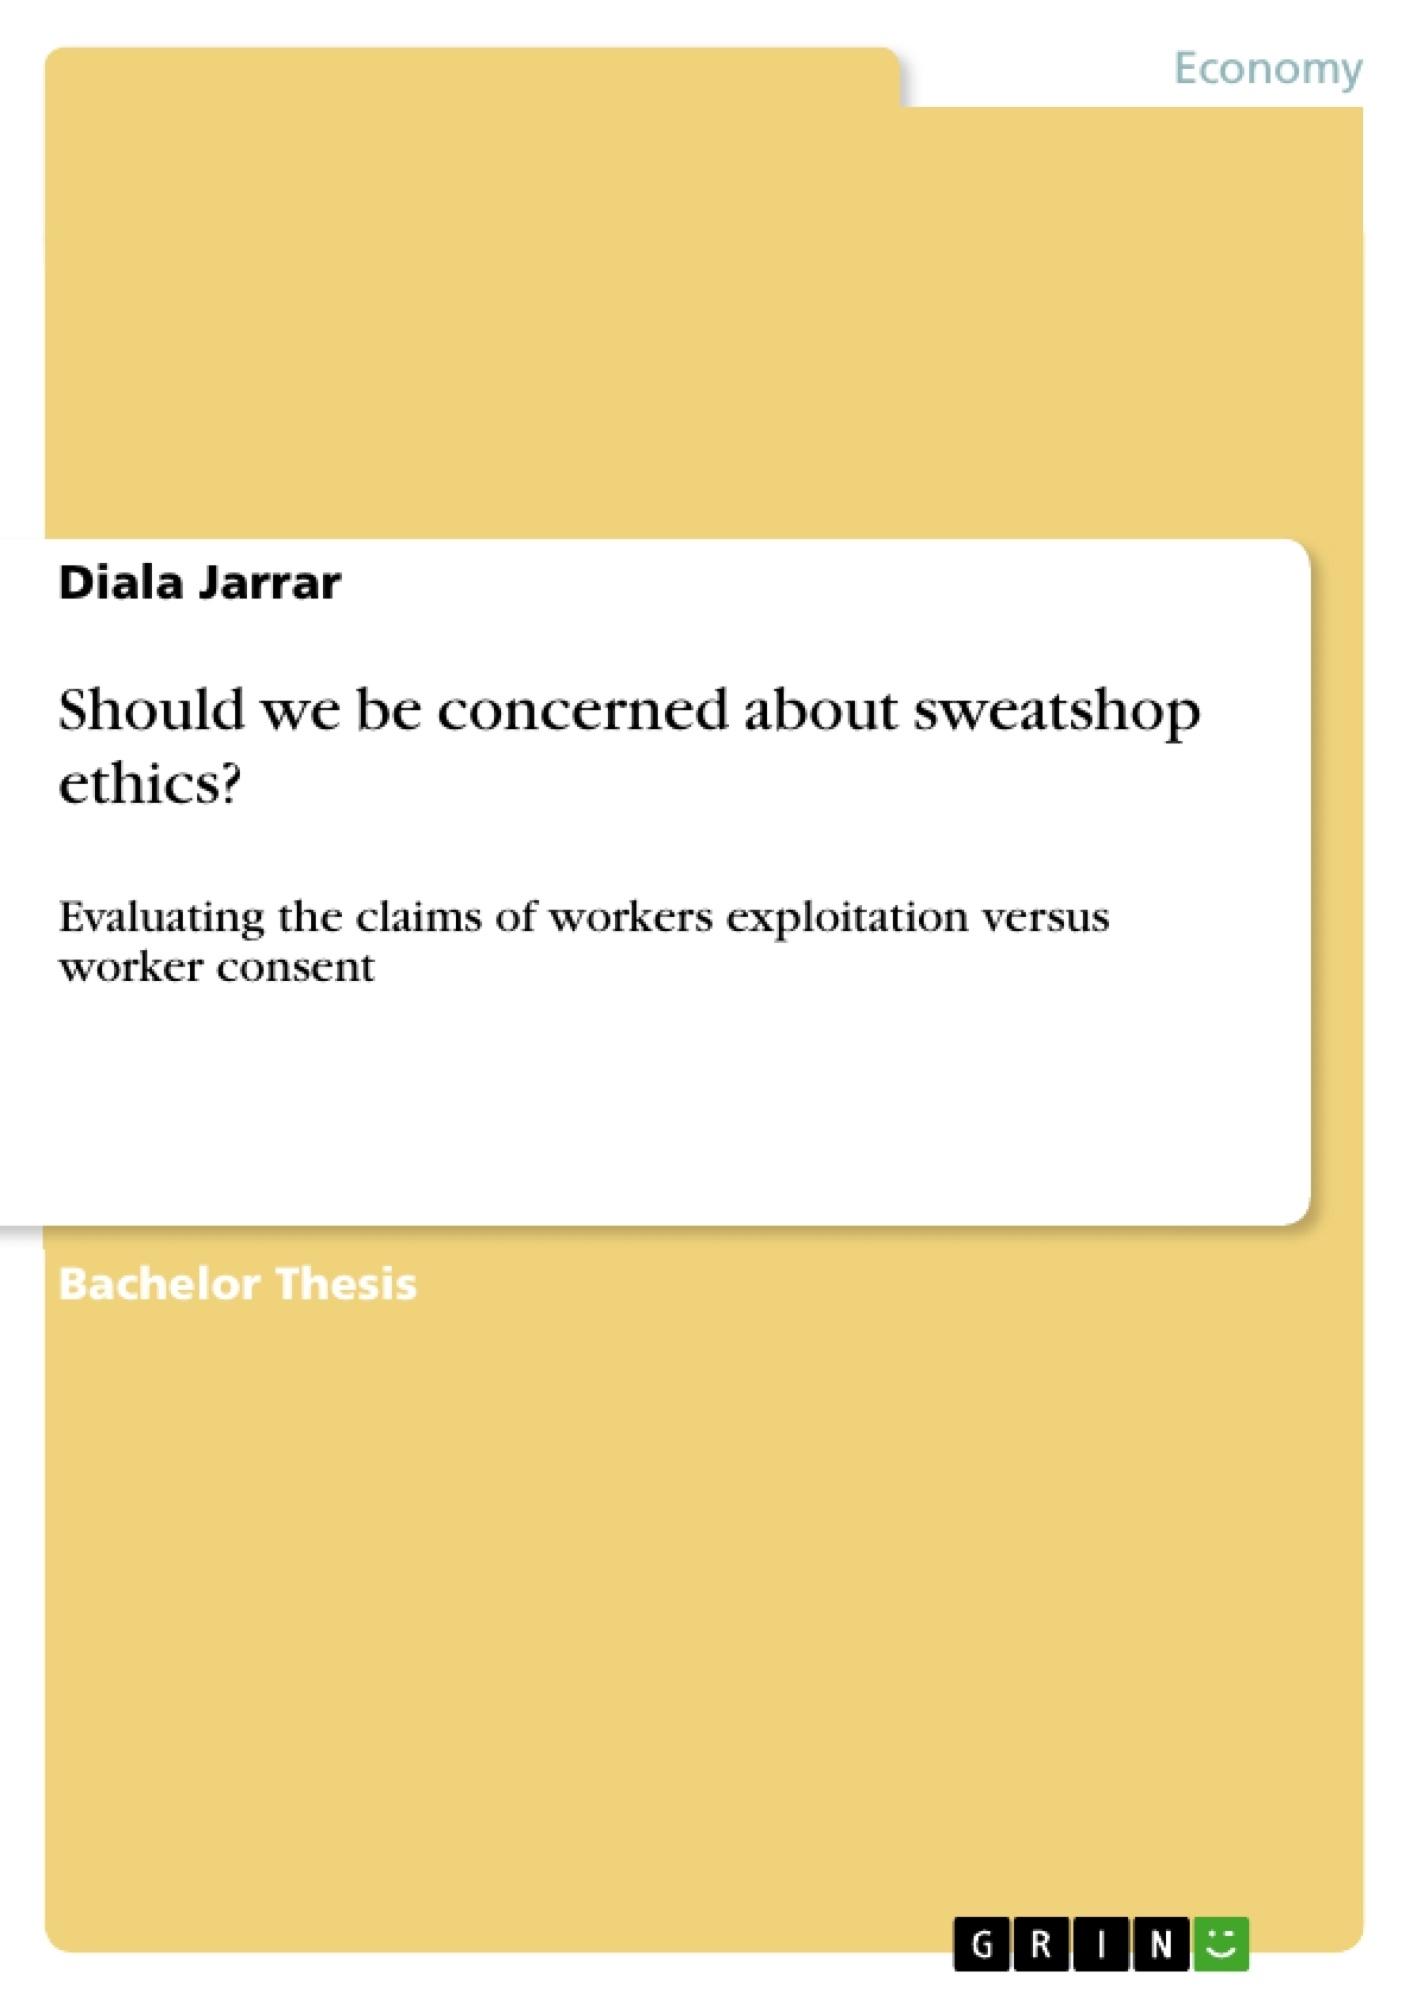 Title: Should we be concerned about sweatshop ethics?